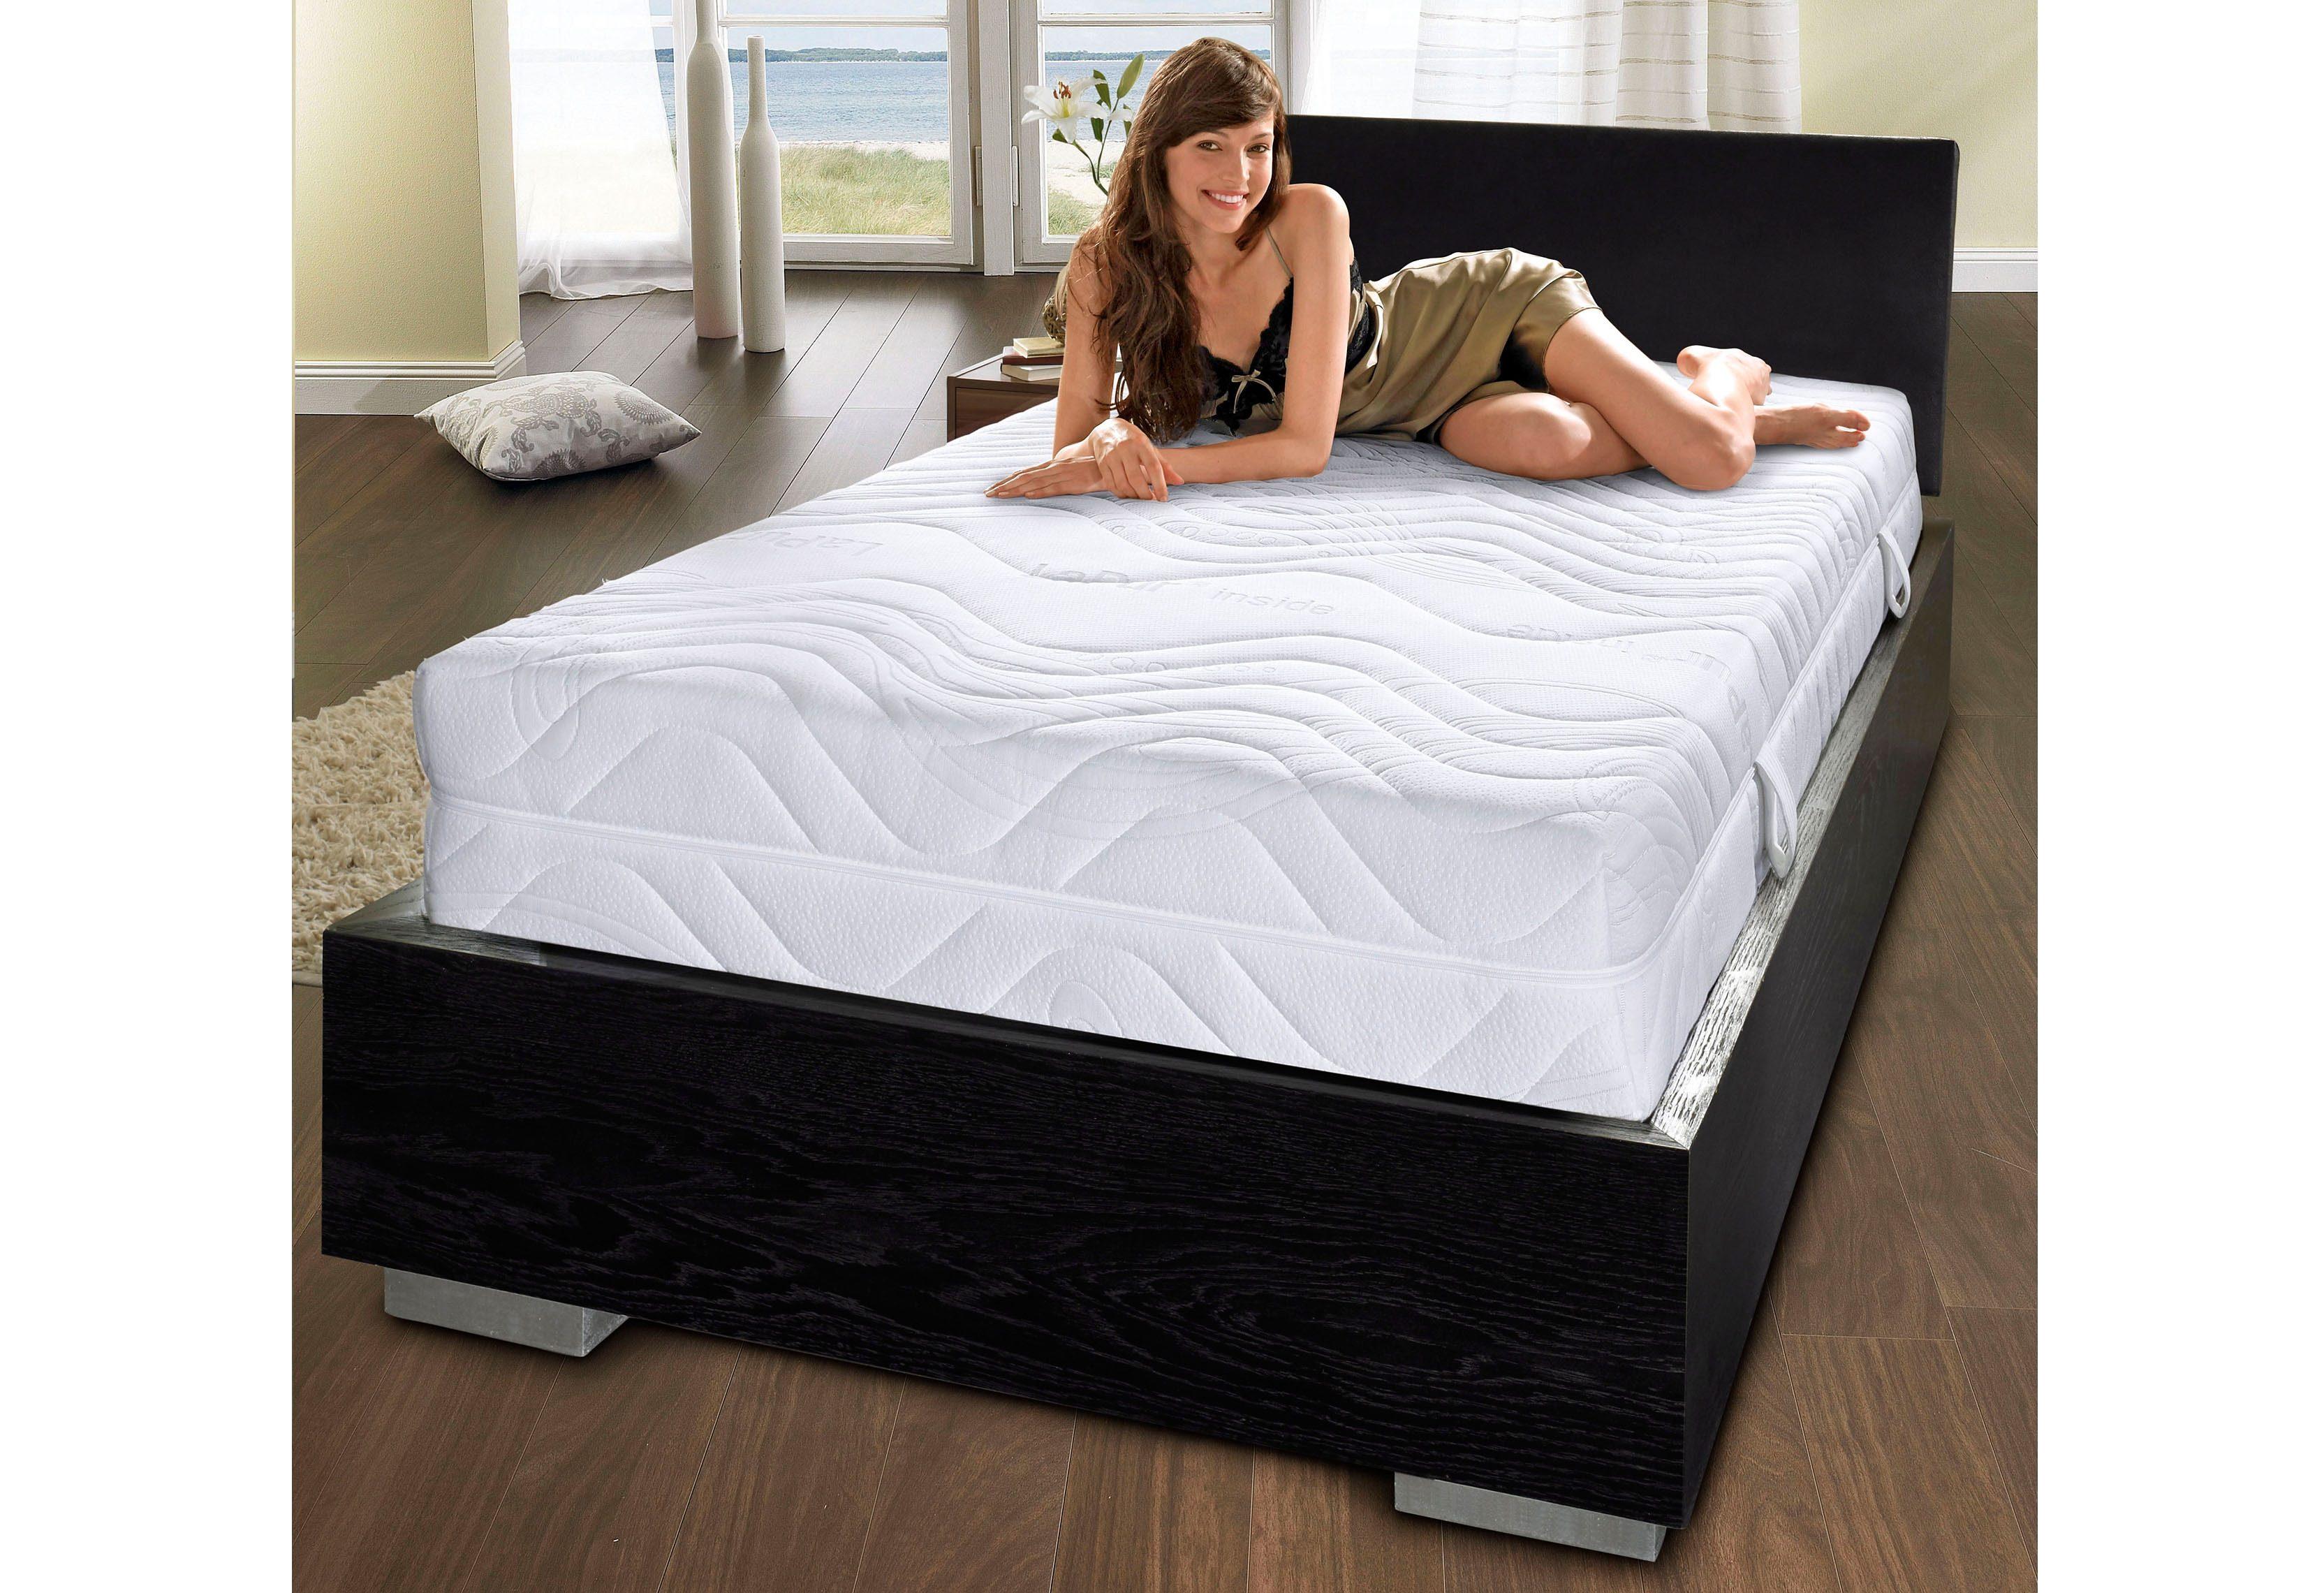 kaltschaummatratze mybalance novum breckle 23 cm hoch. Black Bedroom Furniture Sets. Home Design Ideas